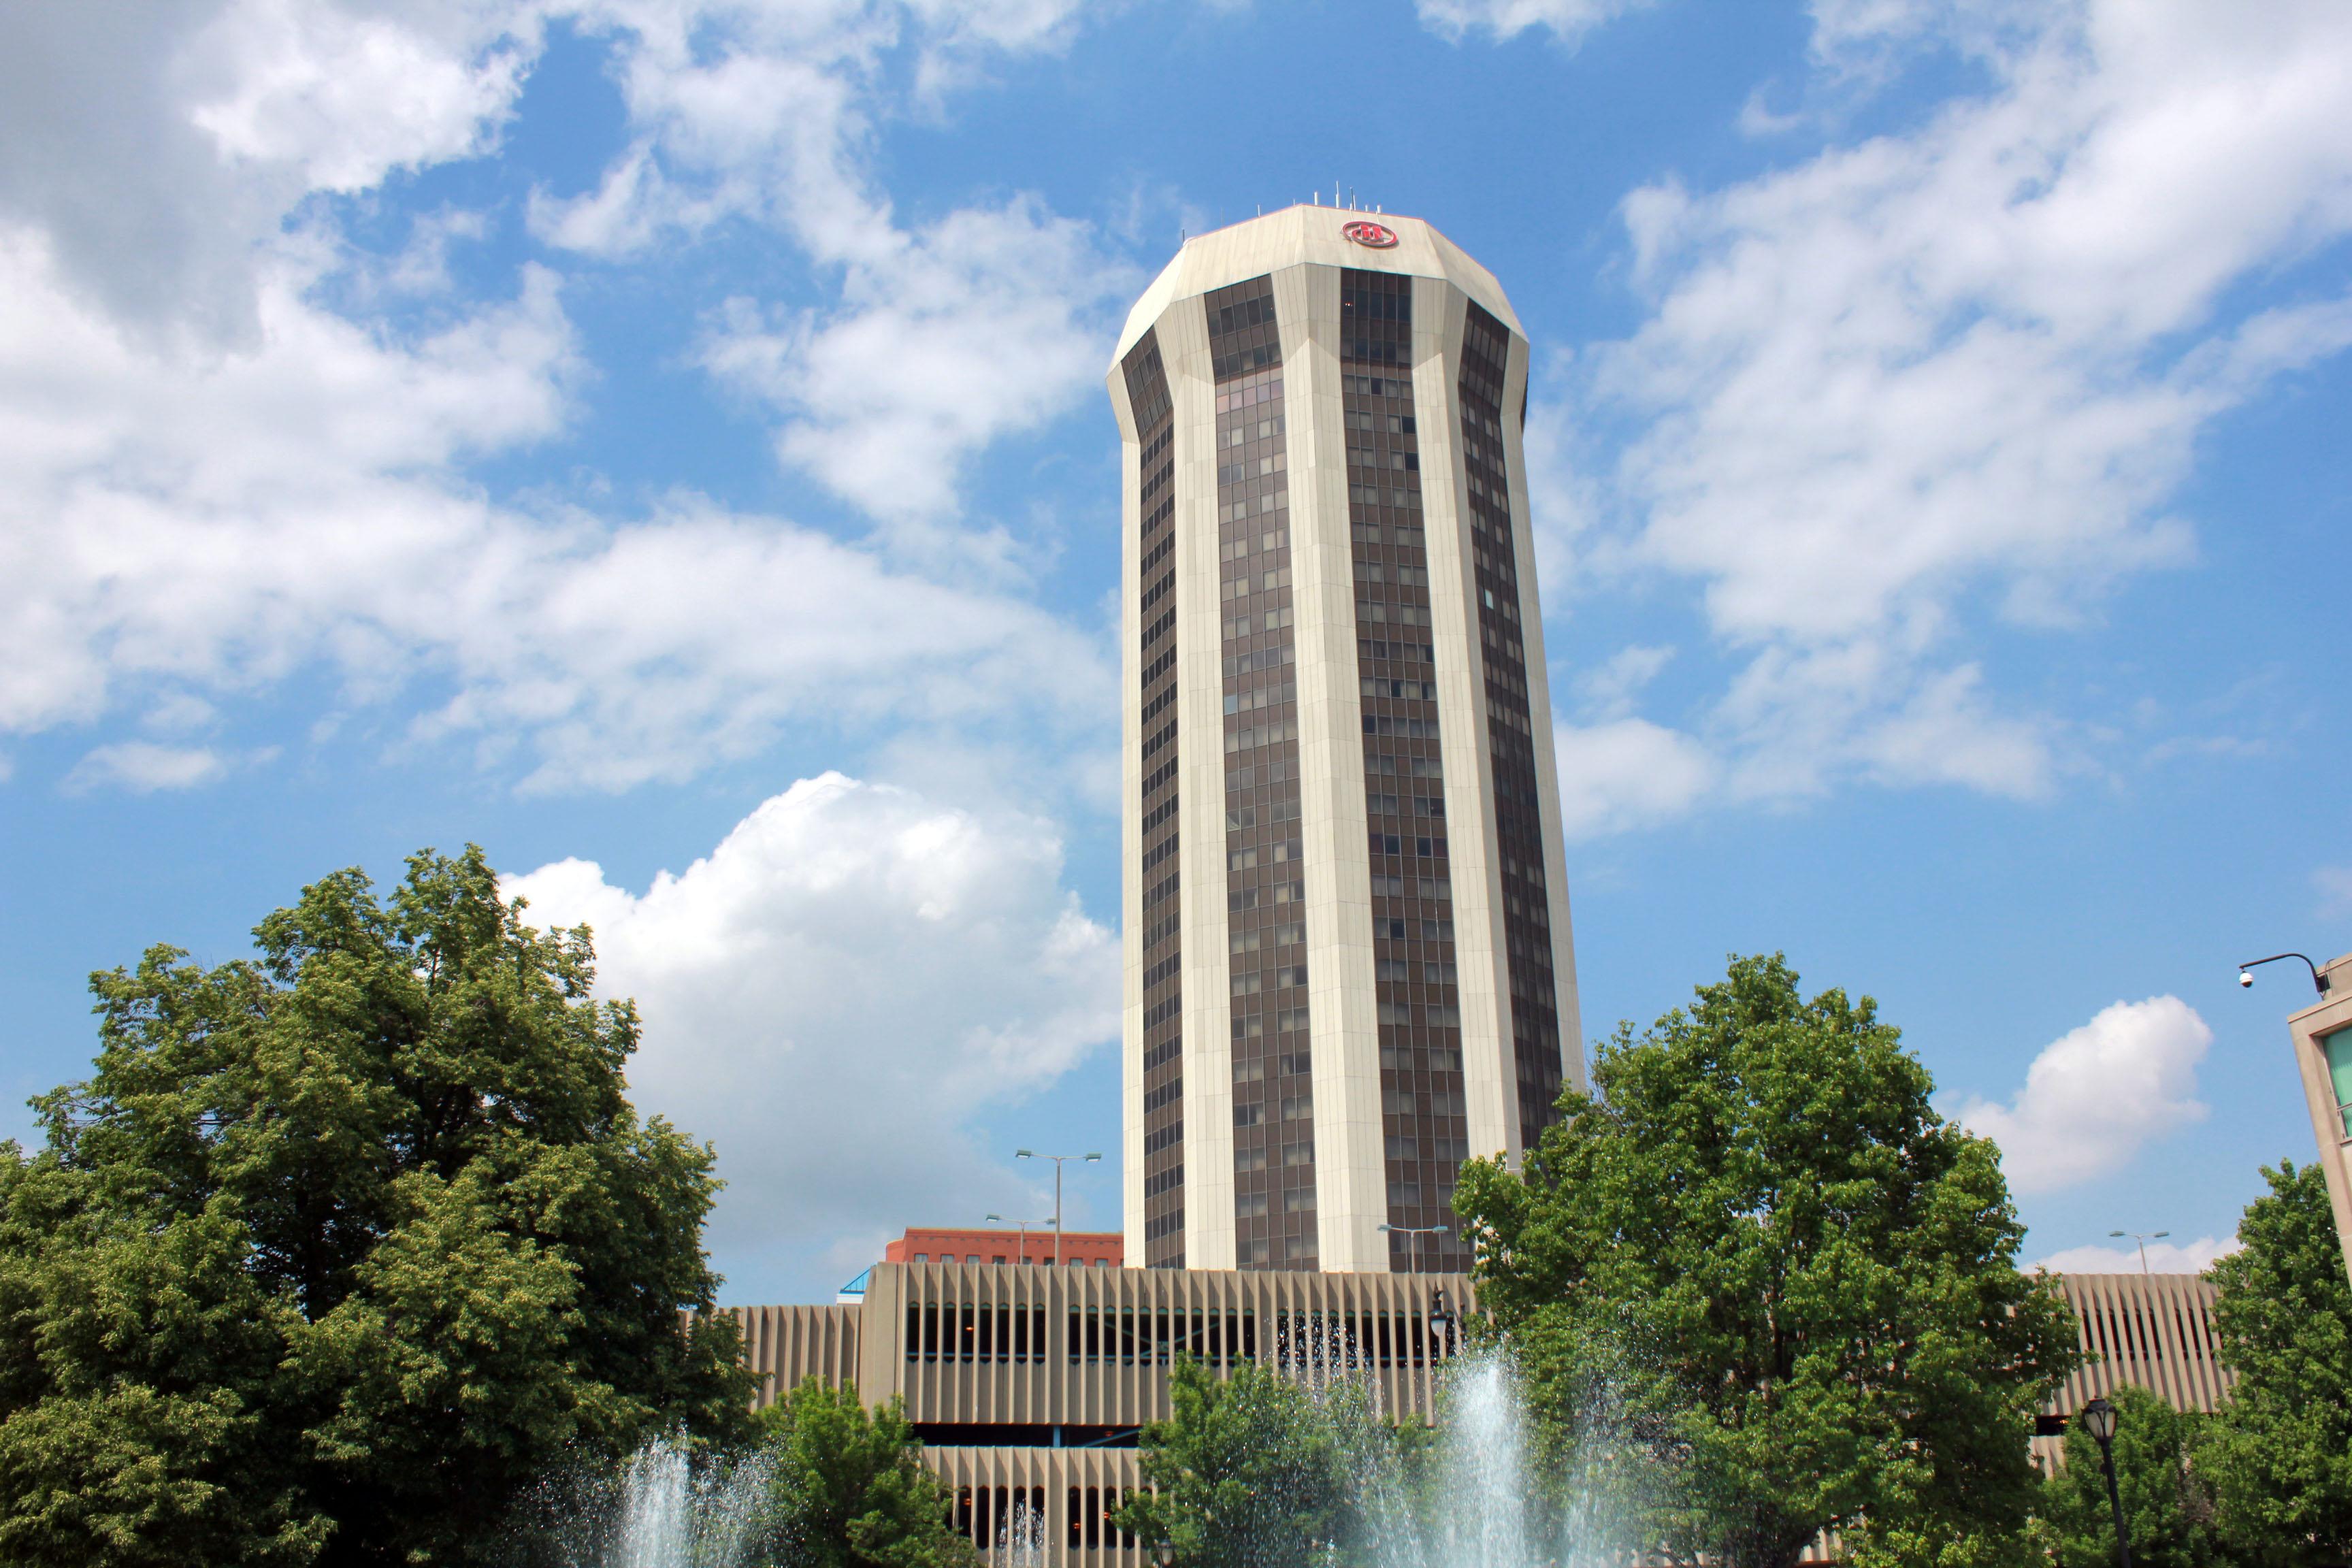 Circular Tower In Springfield Illinois Image Free Stock